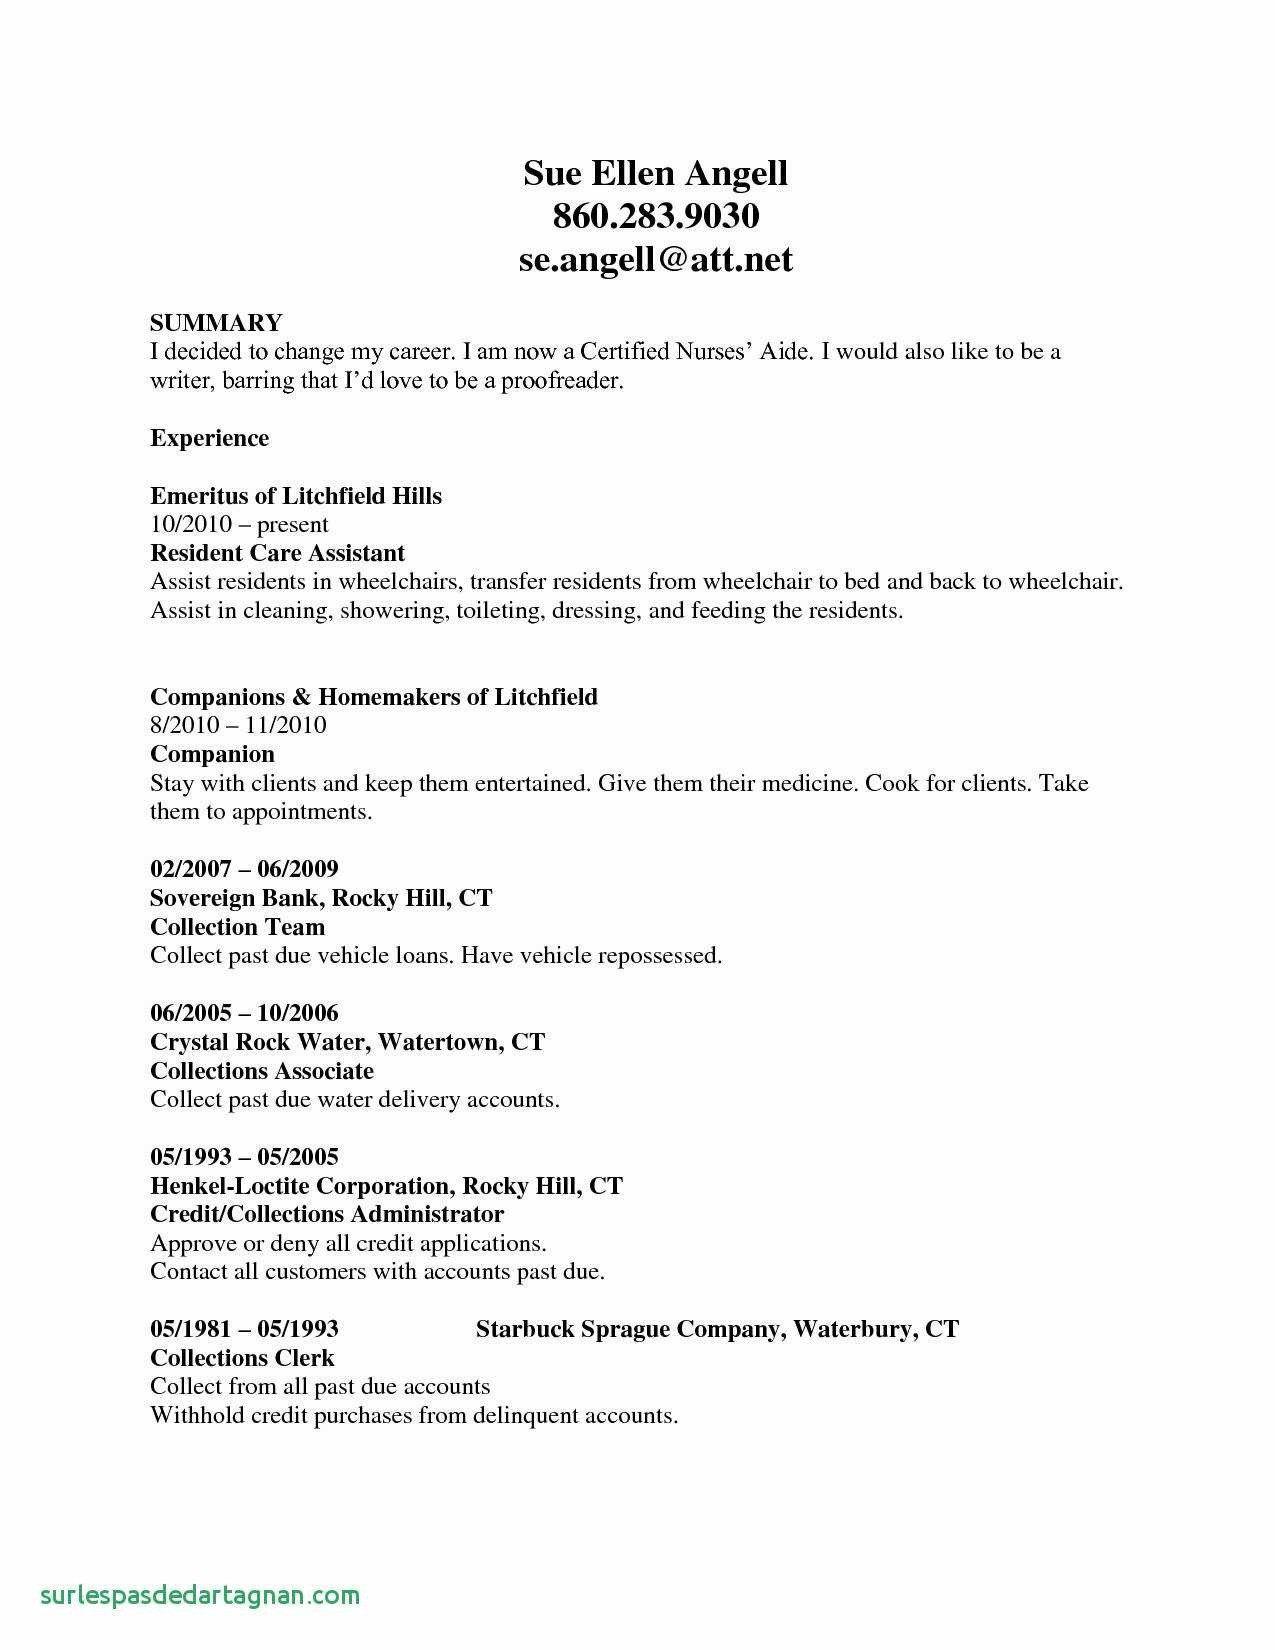 Free Nursing Resume Template Examples